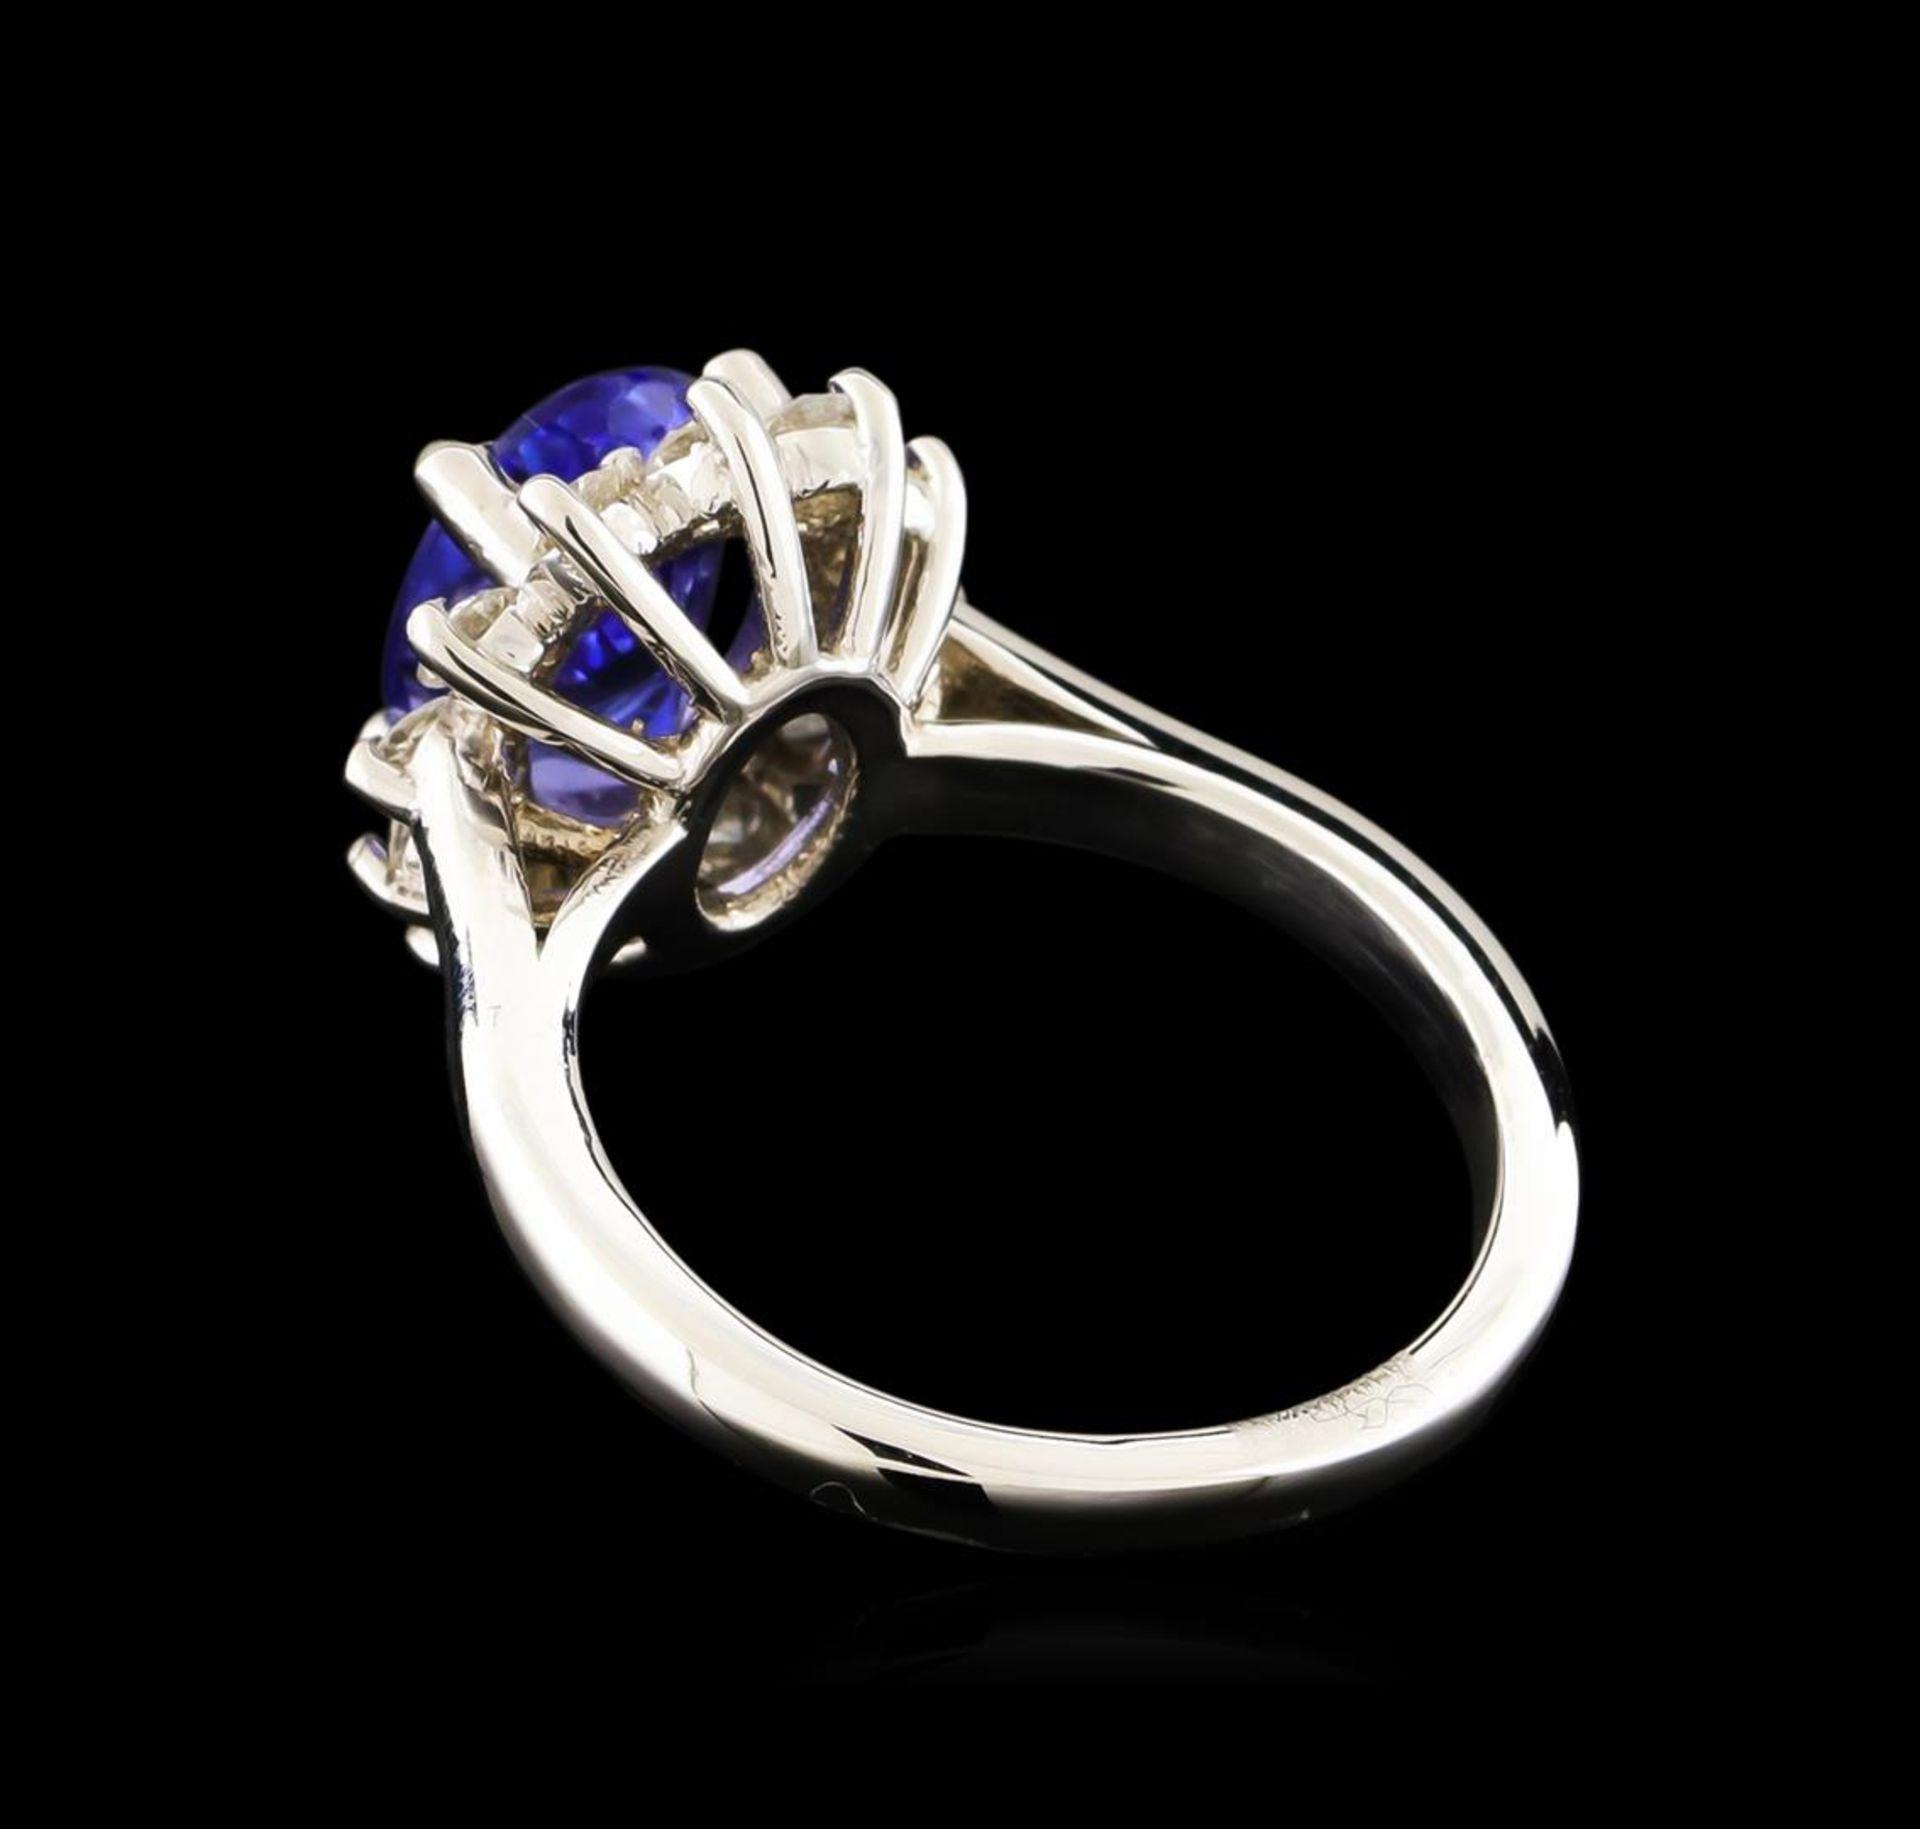 2.61 ctw Tanzanite and Diamond Ring - 14KT White Gold - Image 3 of 5